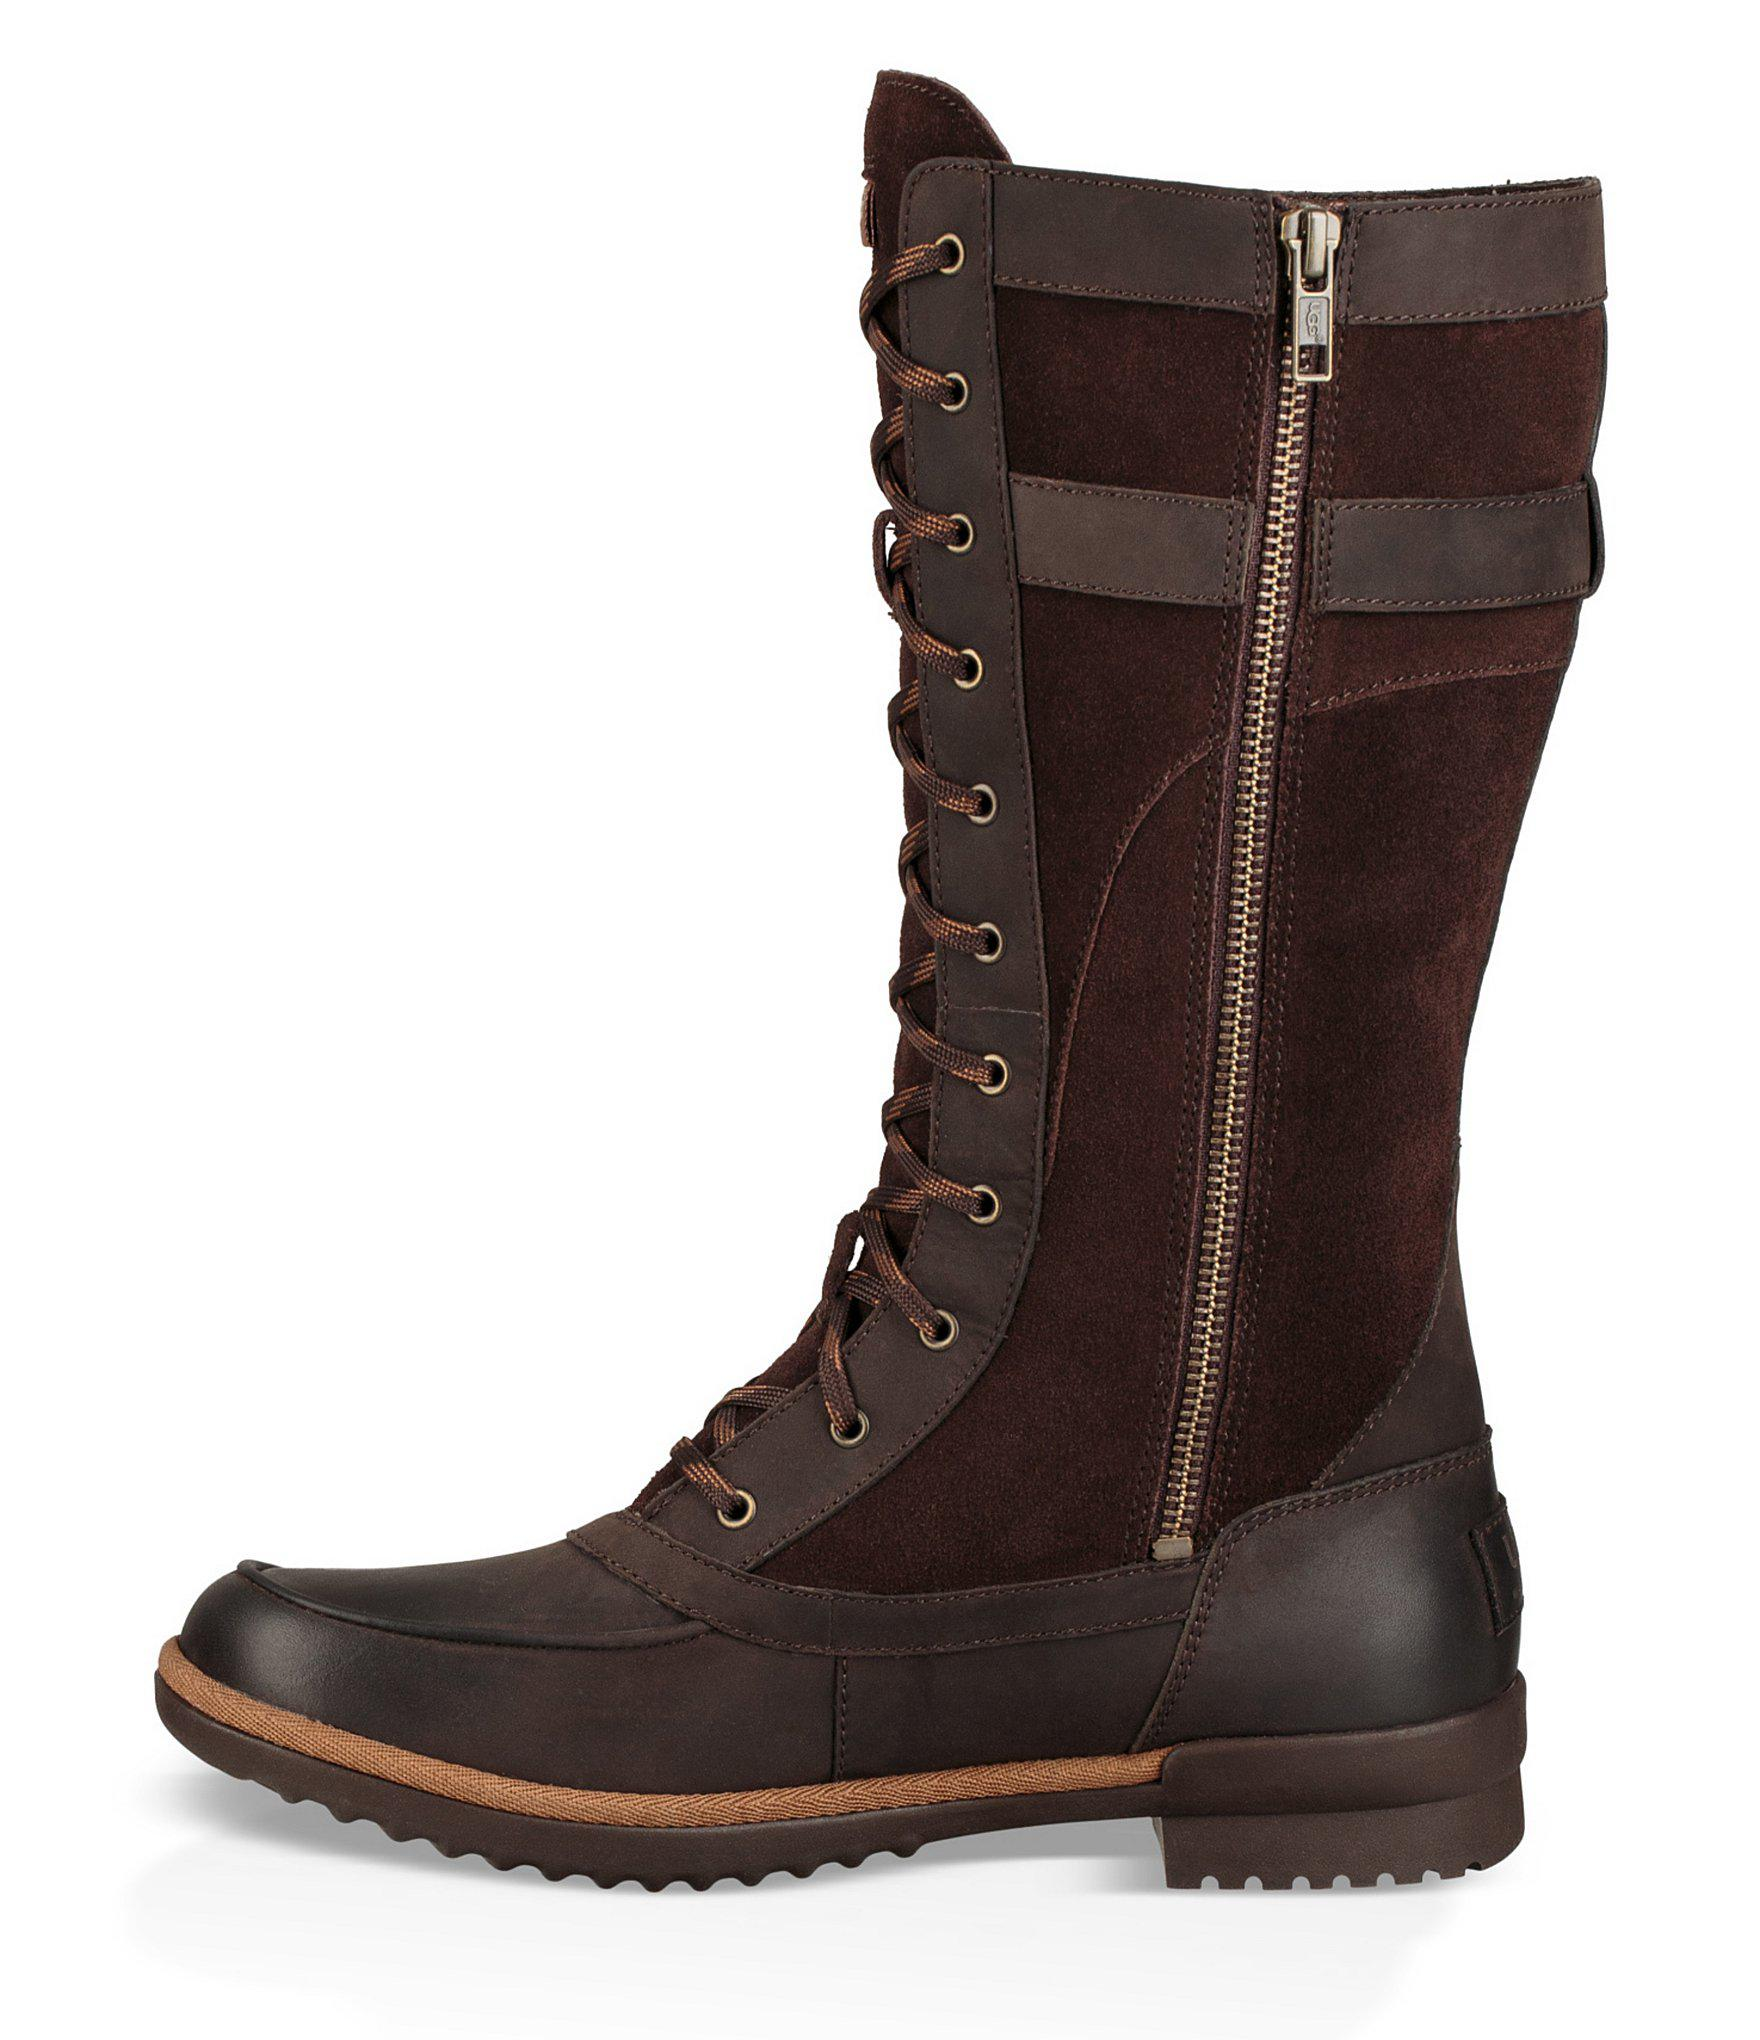 177c6033cd1 purchase ugg suede boots waterproof e7bfa 8b472